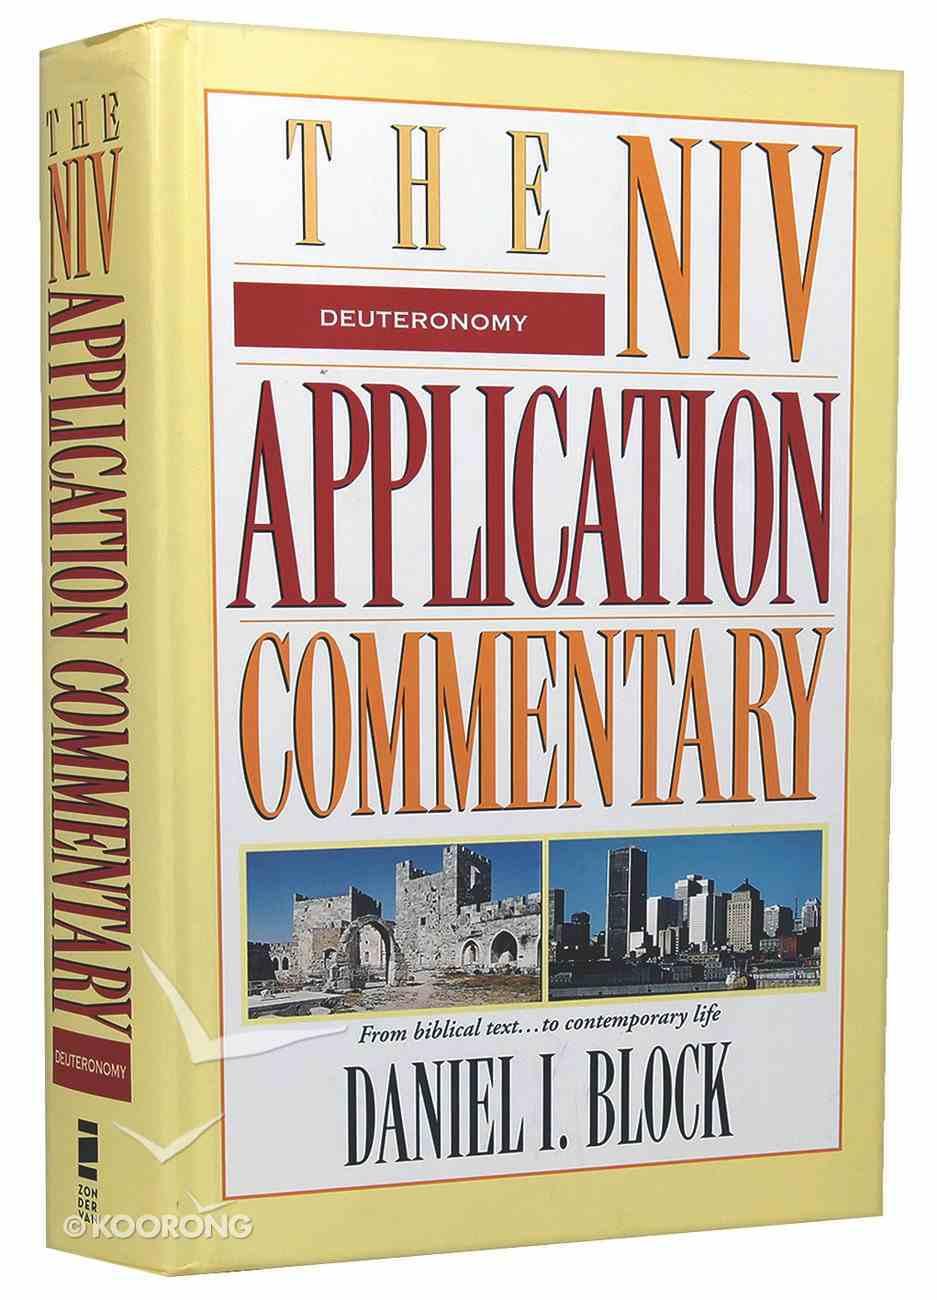 Deuteronomy (Niv Application Commentary Series) Hardback